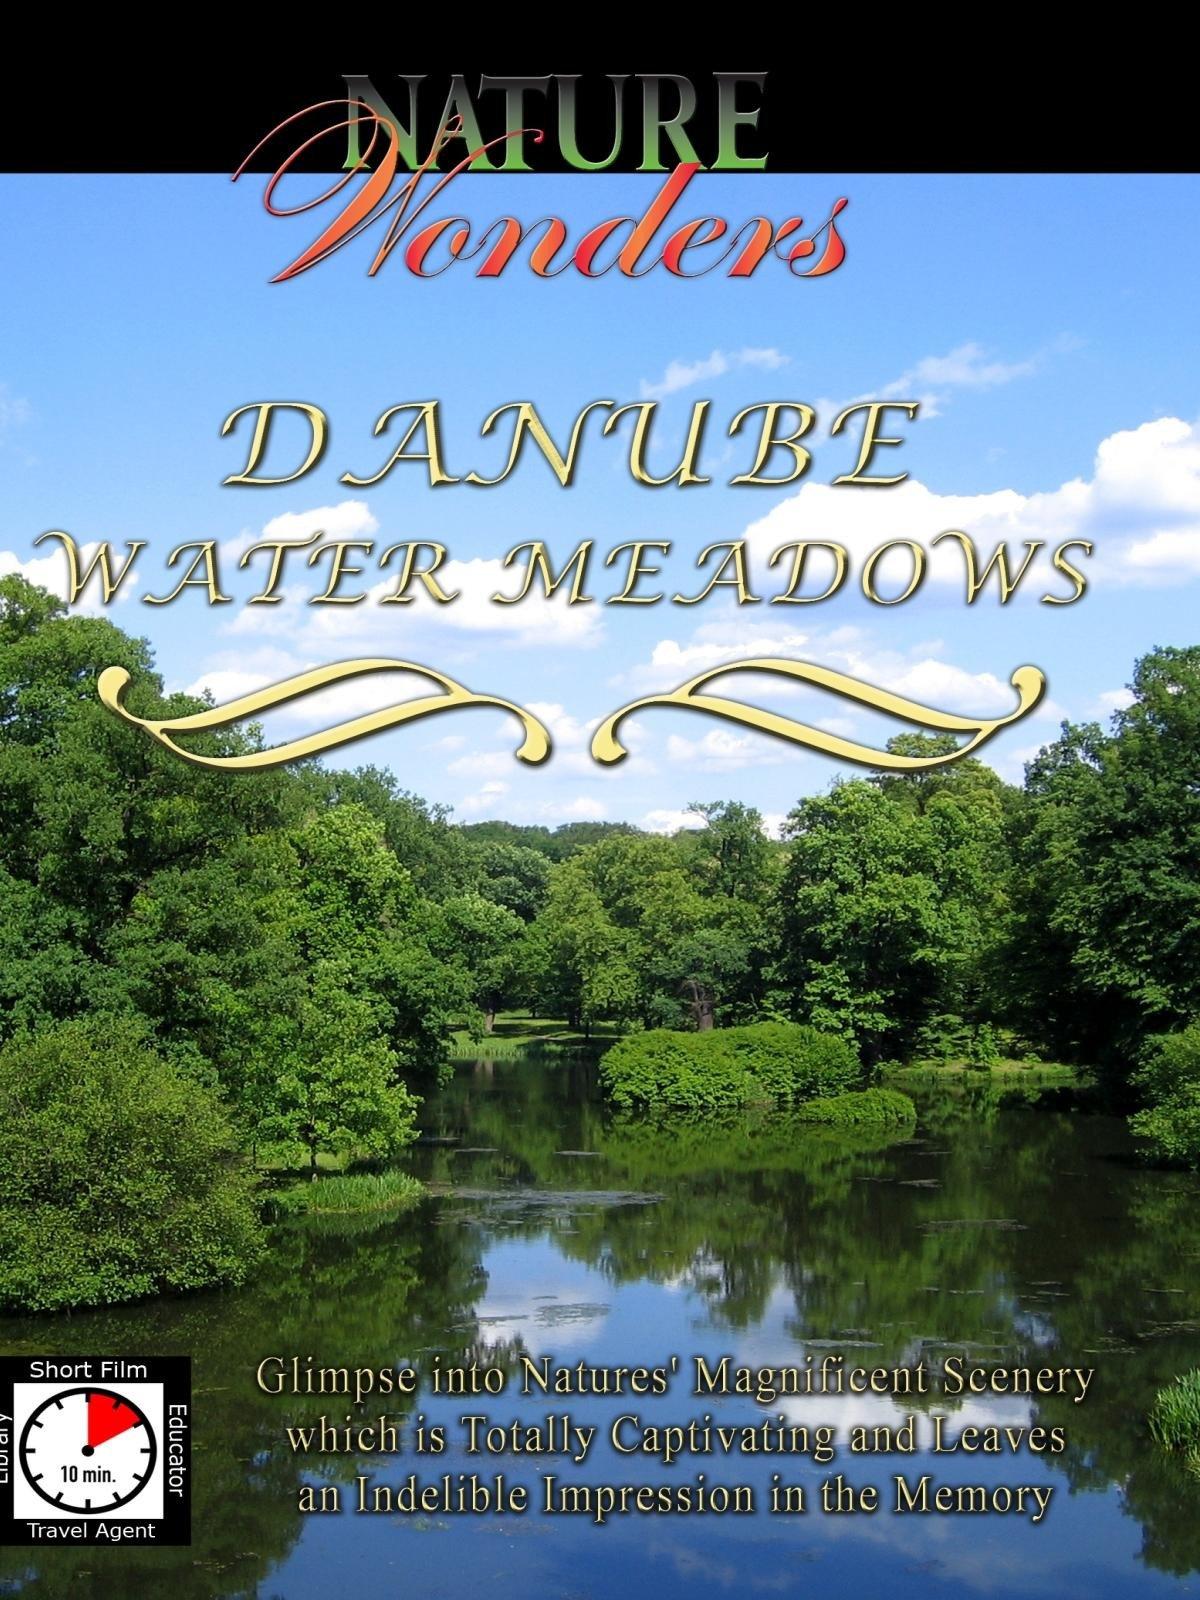 Nature Wonders - Danube Watermeadow - Austria